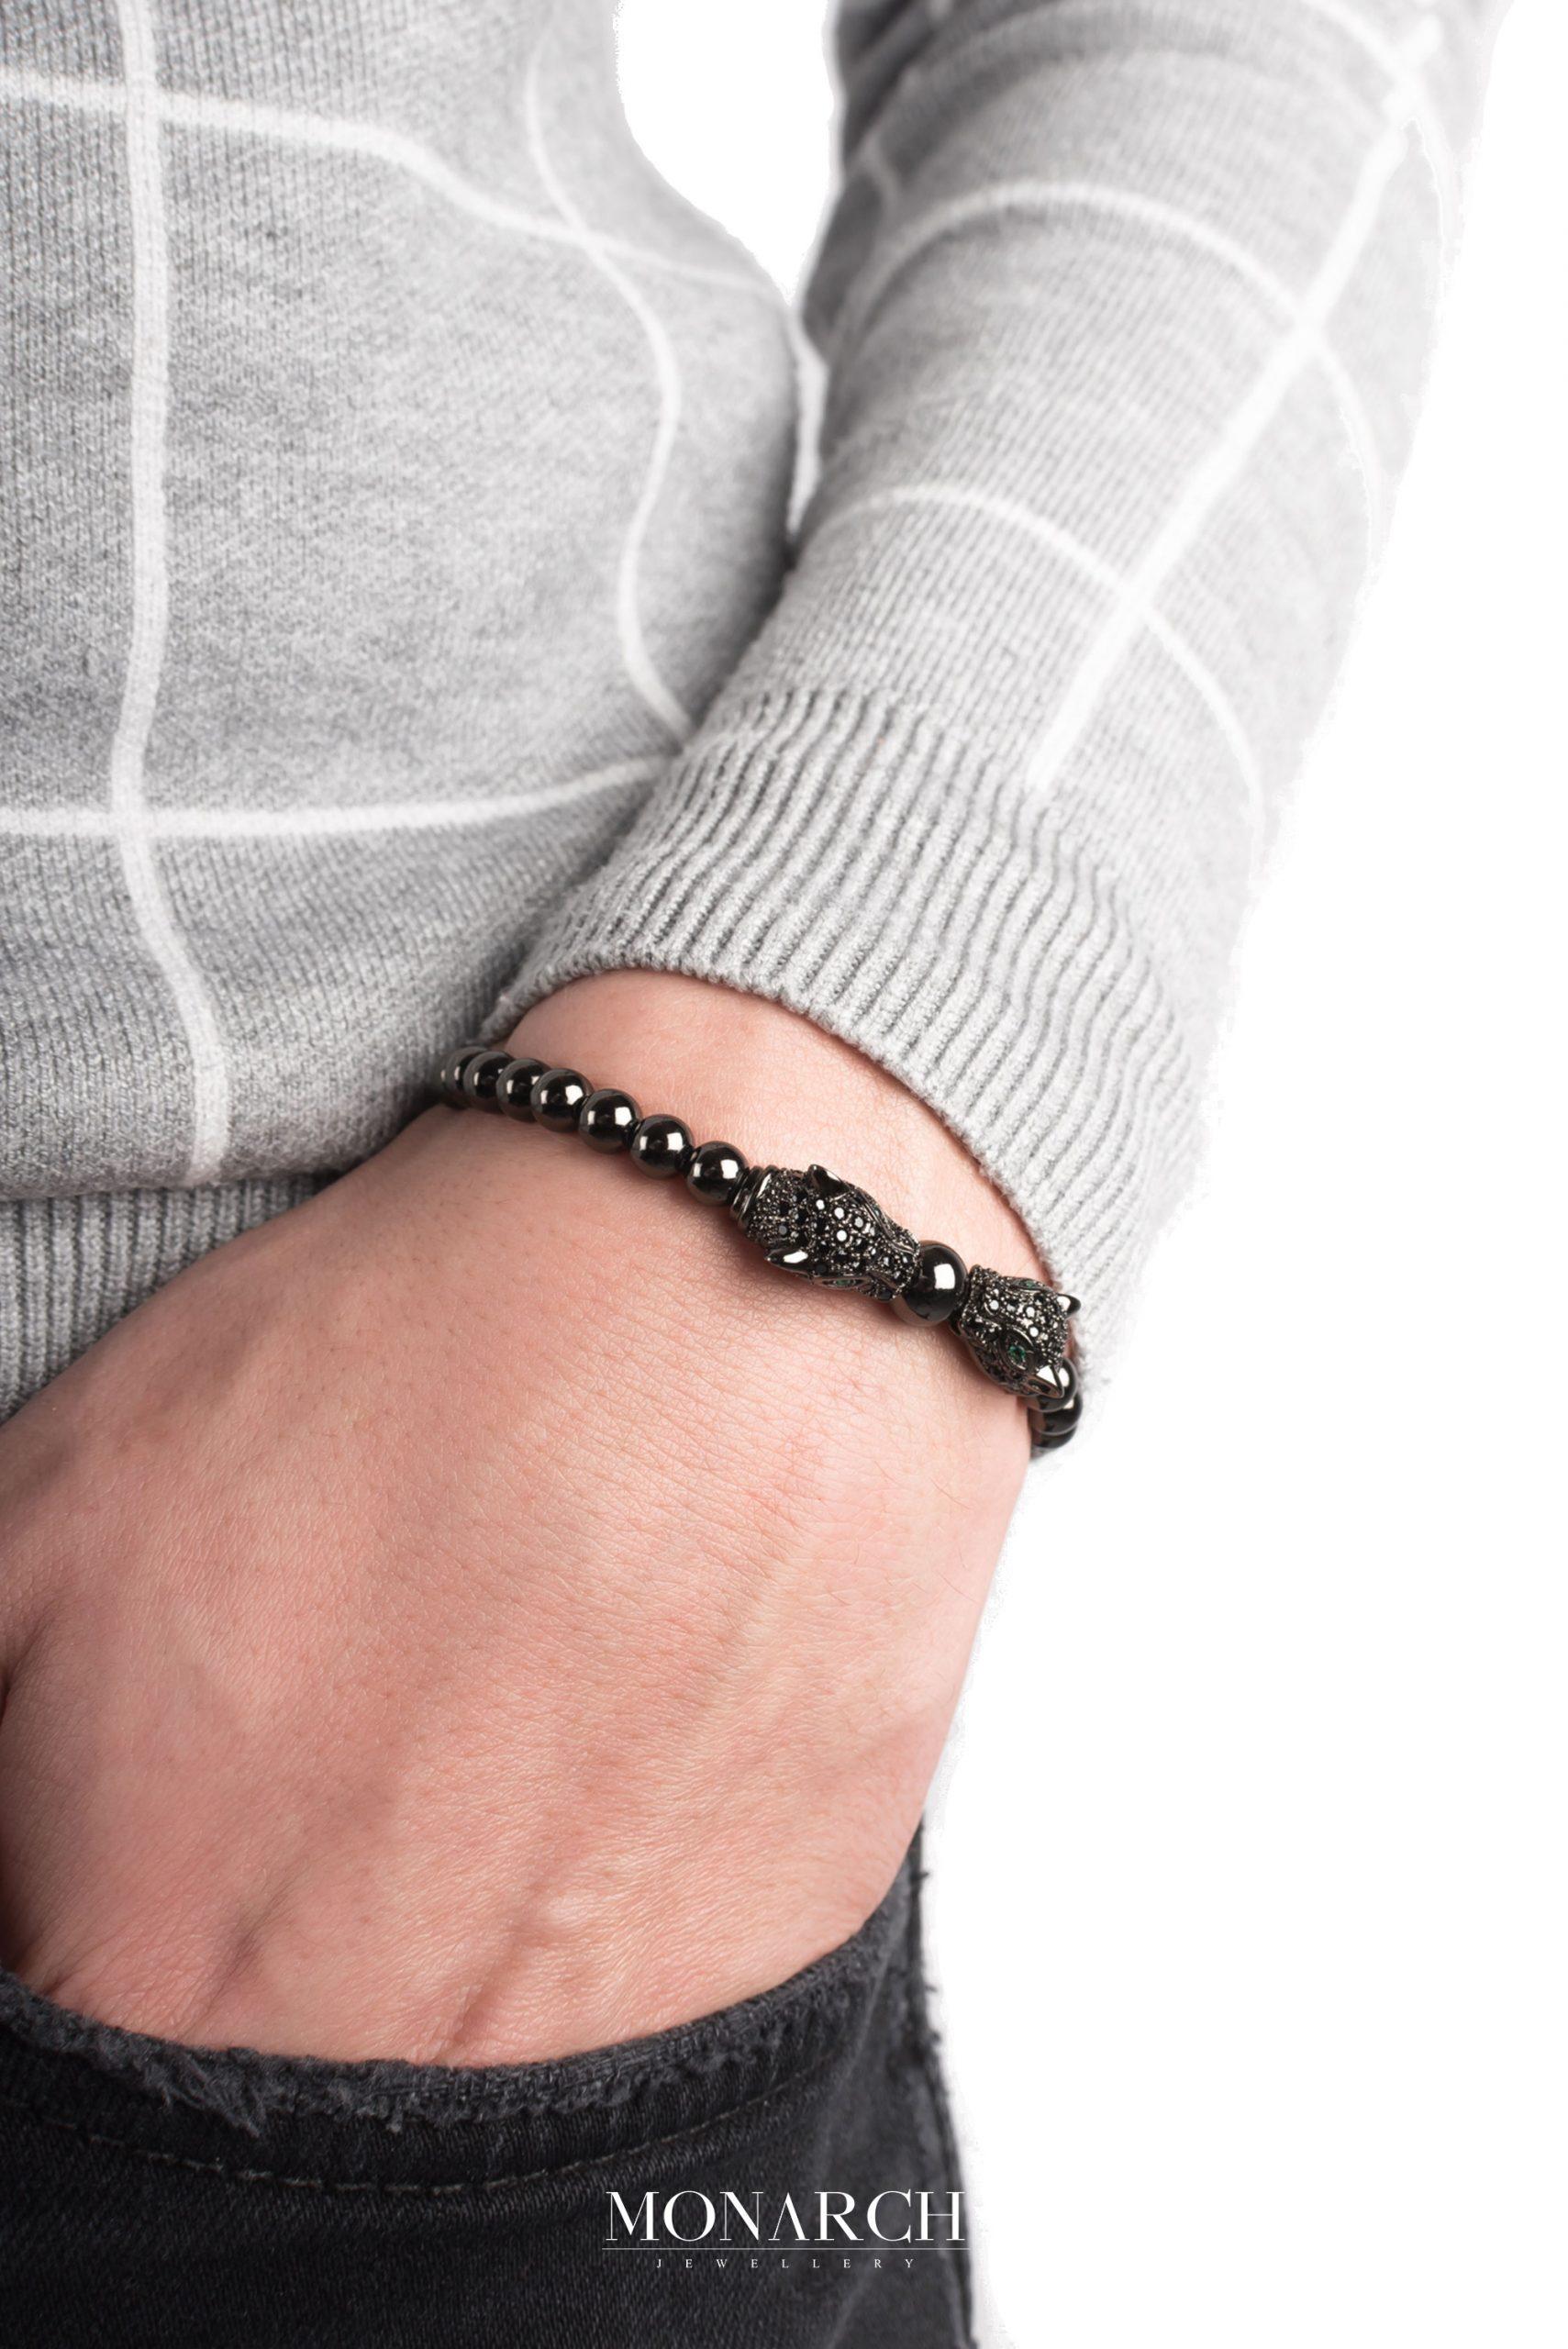 black luxury bracelet for man, monarch jewellery MA148NWM